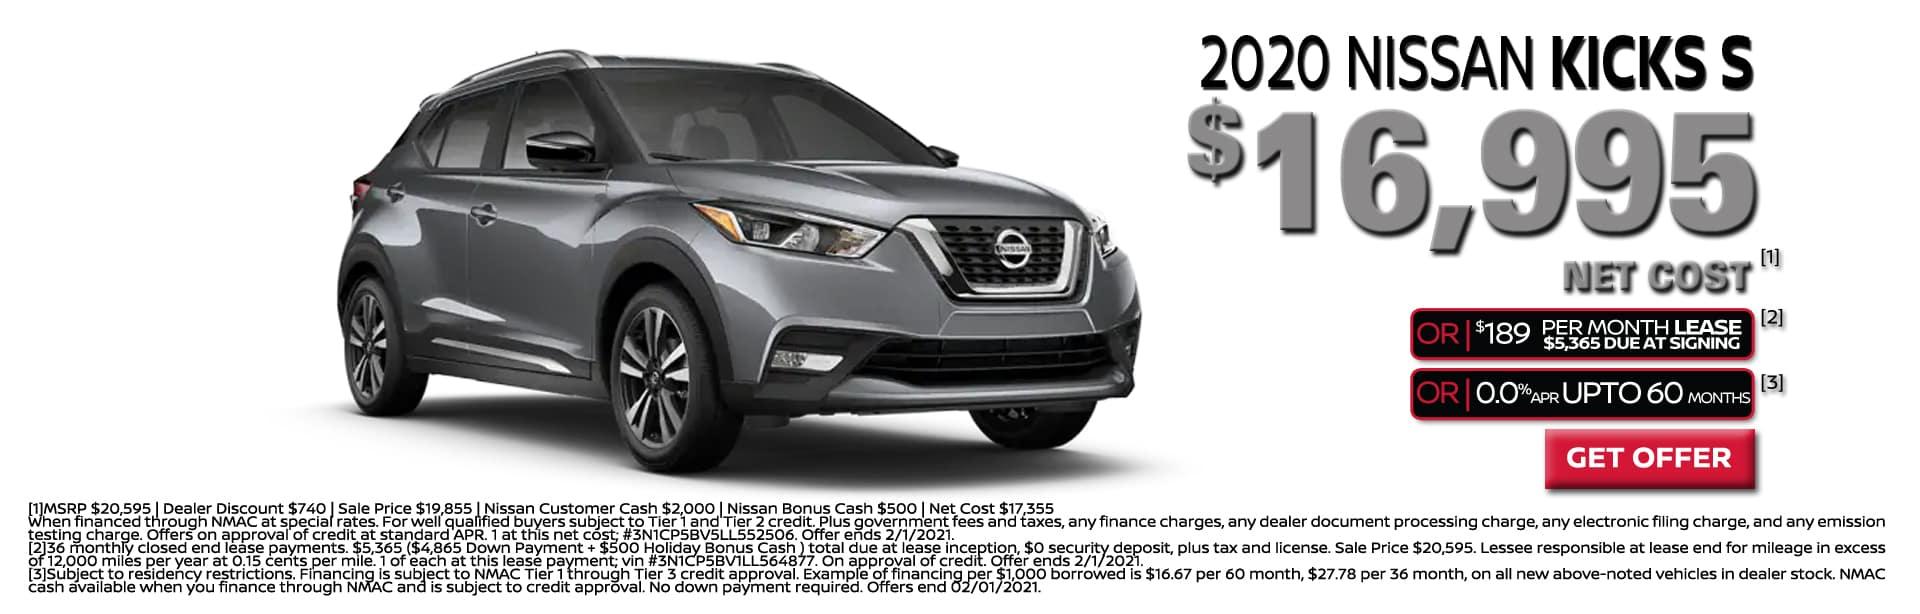 DealerInspire_2020-Nissan_Kicks_Jan21